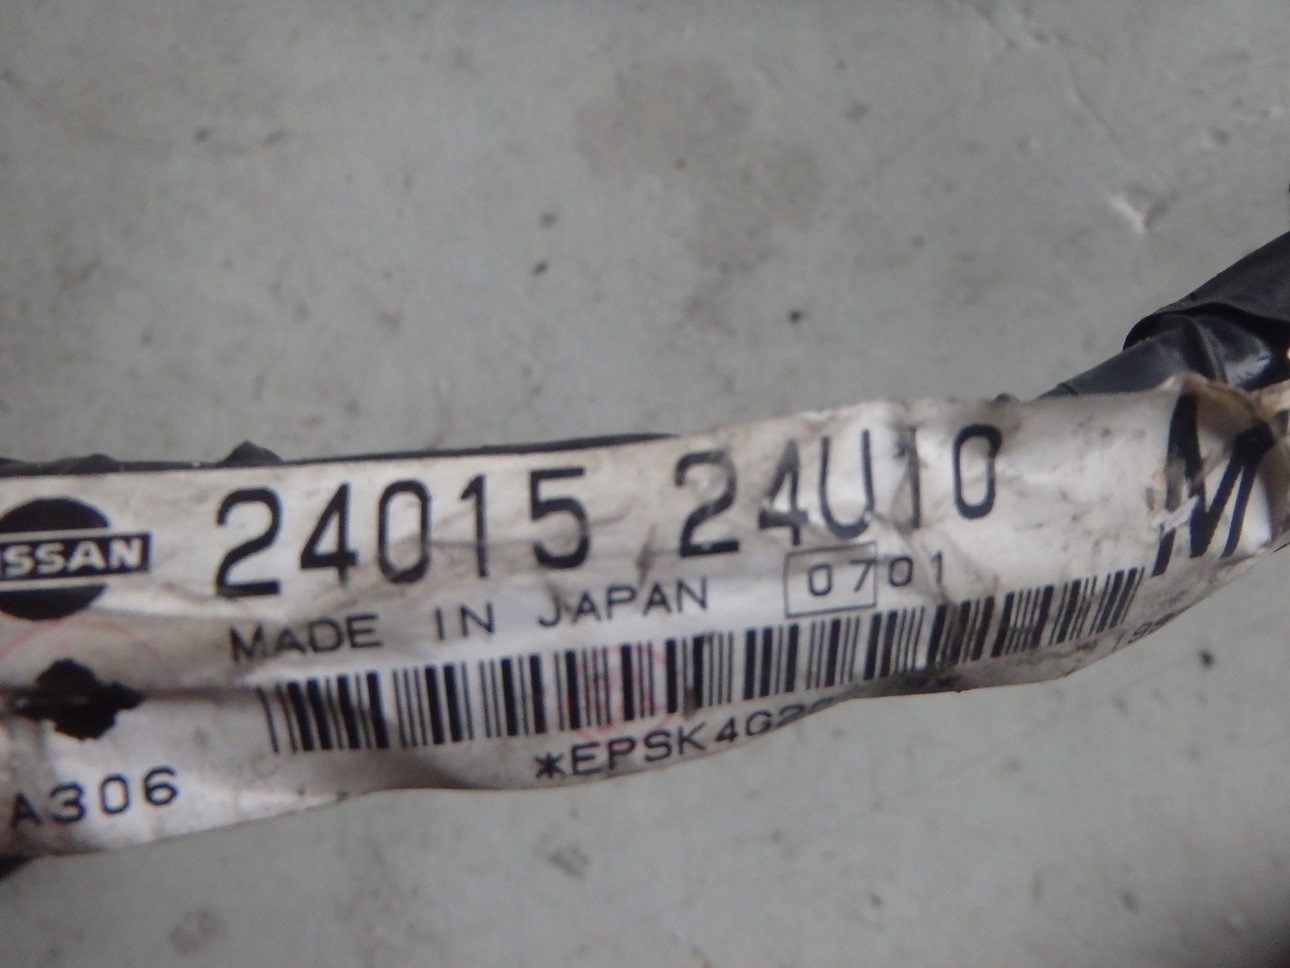 Nissan Skyline R33 Bcnr33 Gtr Tail Wiring Loom Harness 24015 24u10 Labels 1